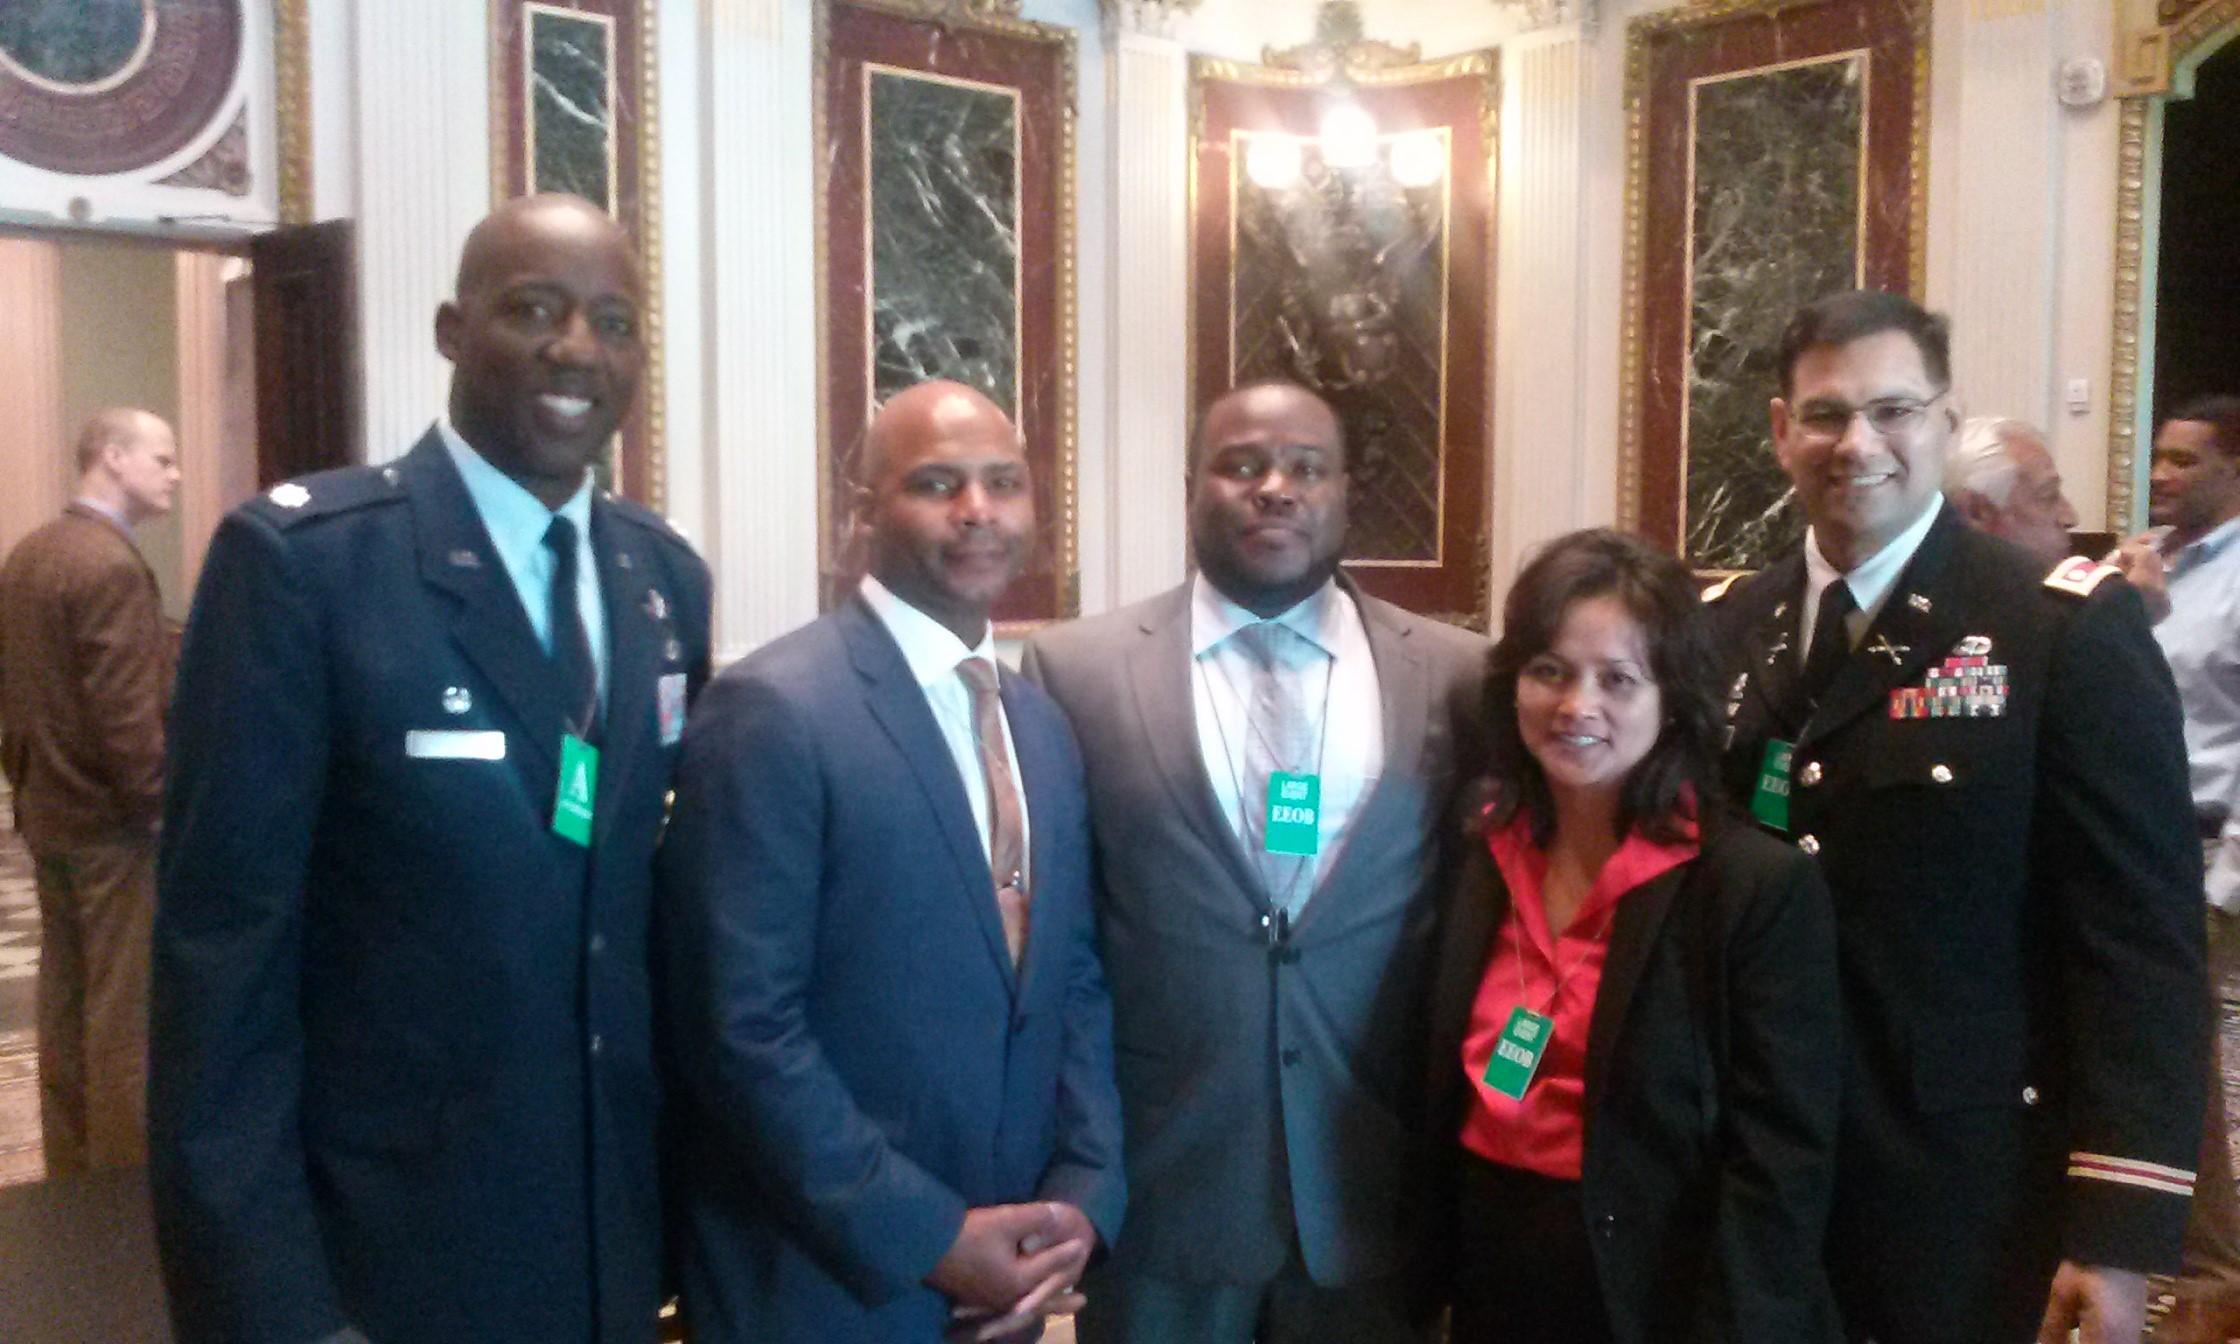 Antione (Center) with White House Representatives in DC, honoring veterans in entrepreneurship